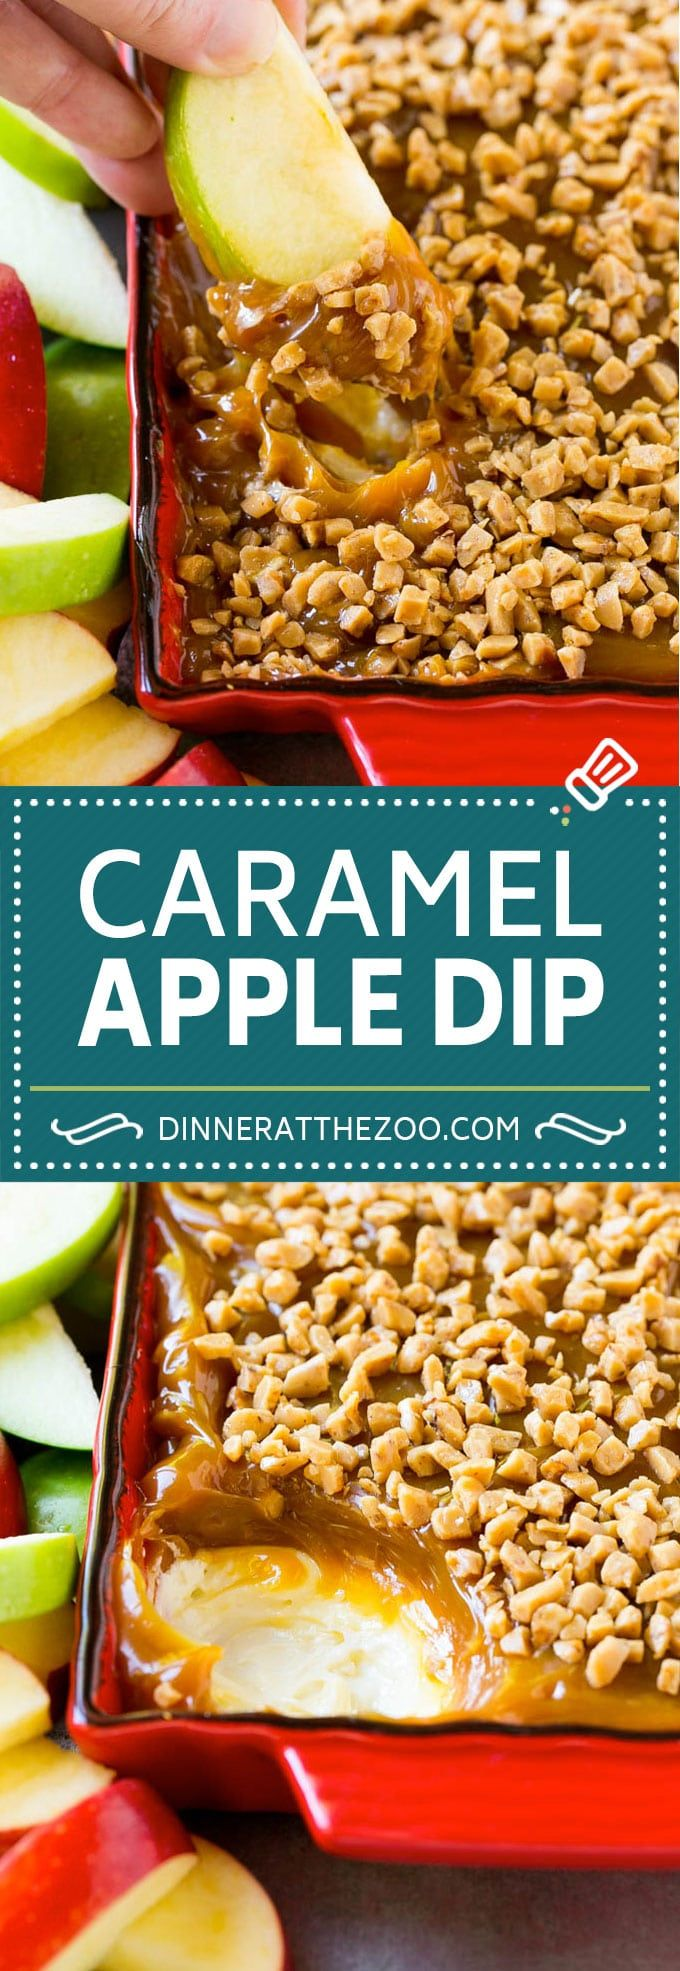 Caramel Apple Dip Recipe | Dessert Dip Recipe | Apple Recipe | Caramel Apple Recipe #caramel #apples #dip #fall #dessert #dinneratthezoo #caramelapples